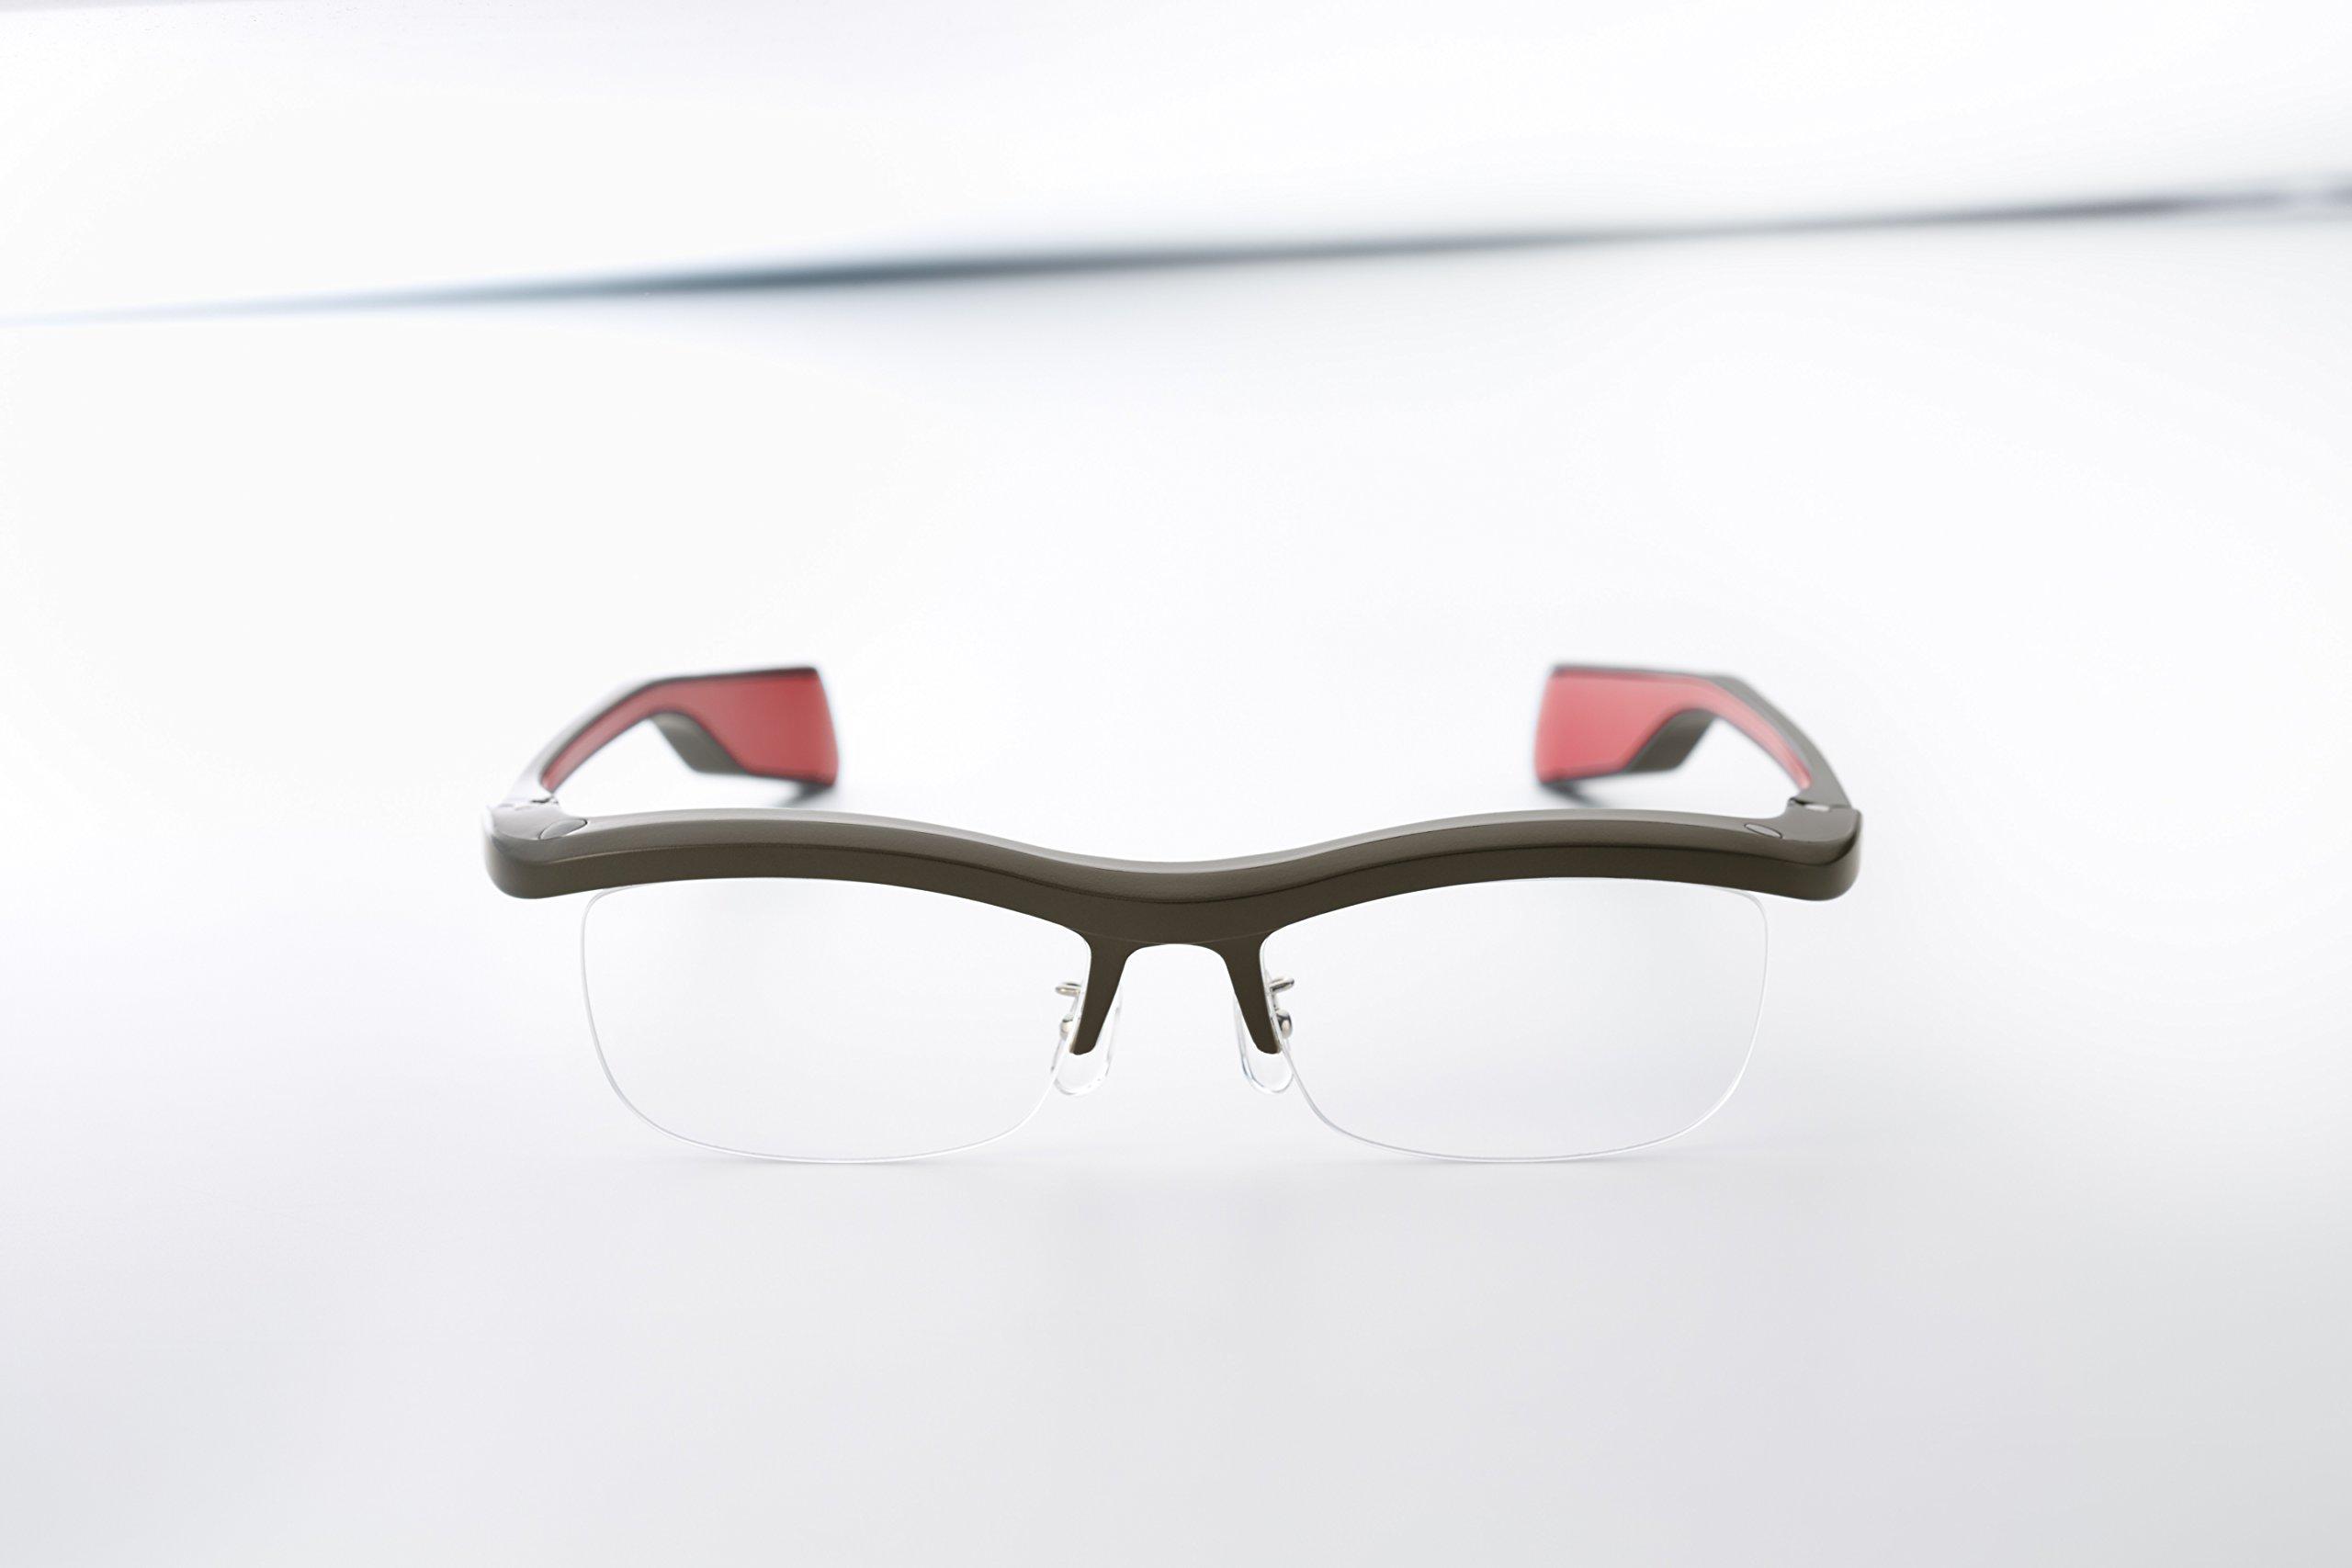 FUN'IKI Glasses (Gray/Red)